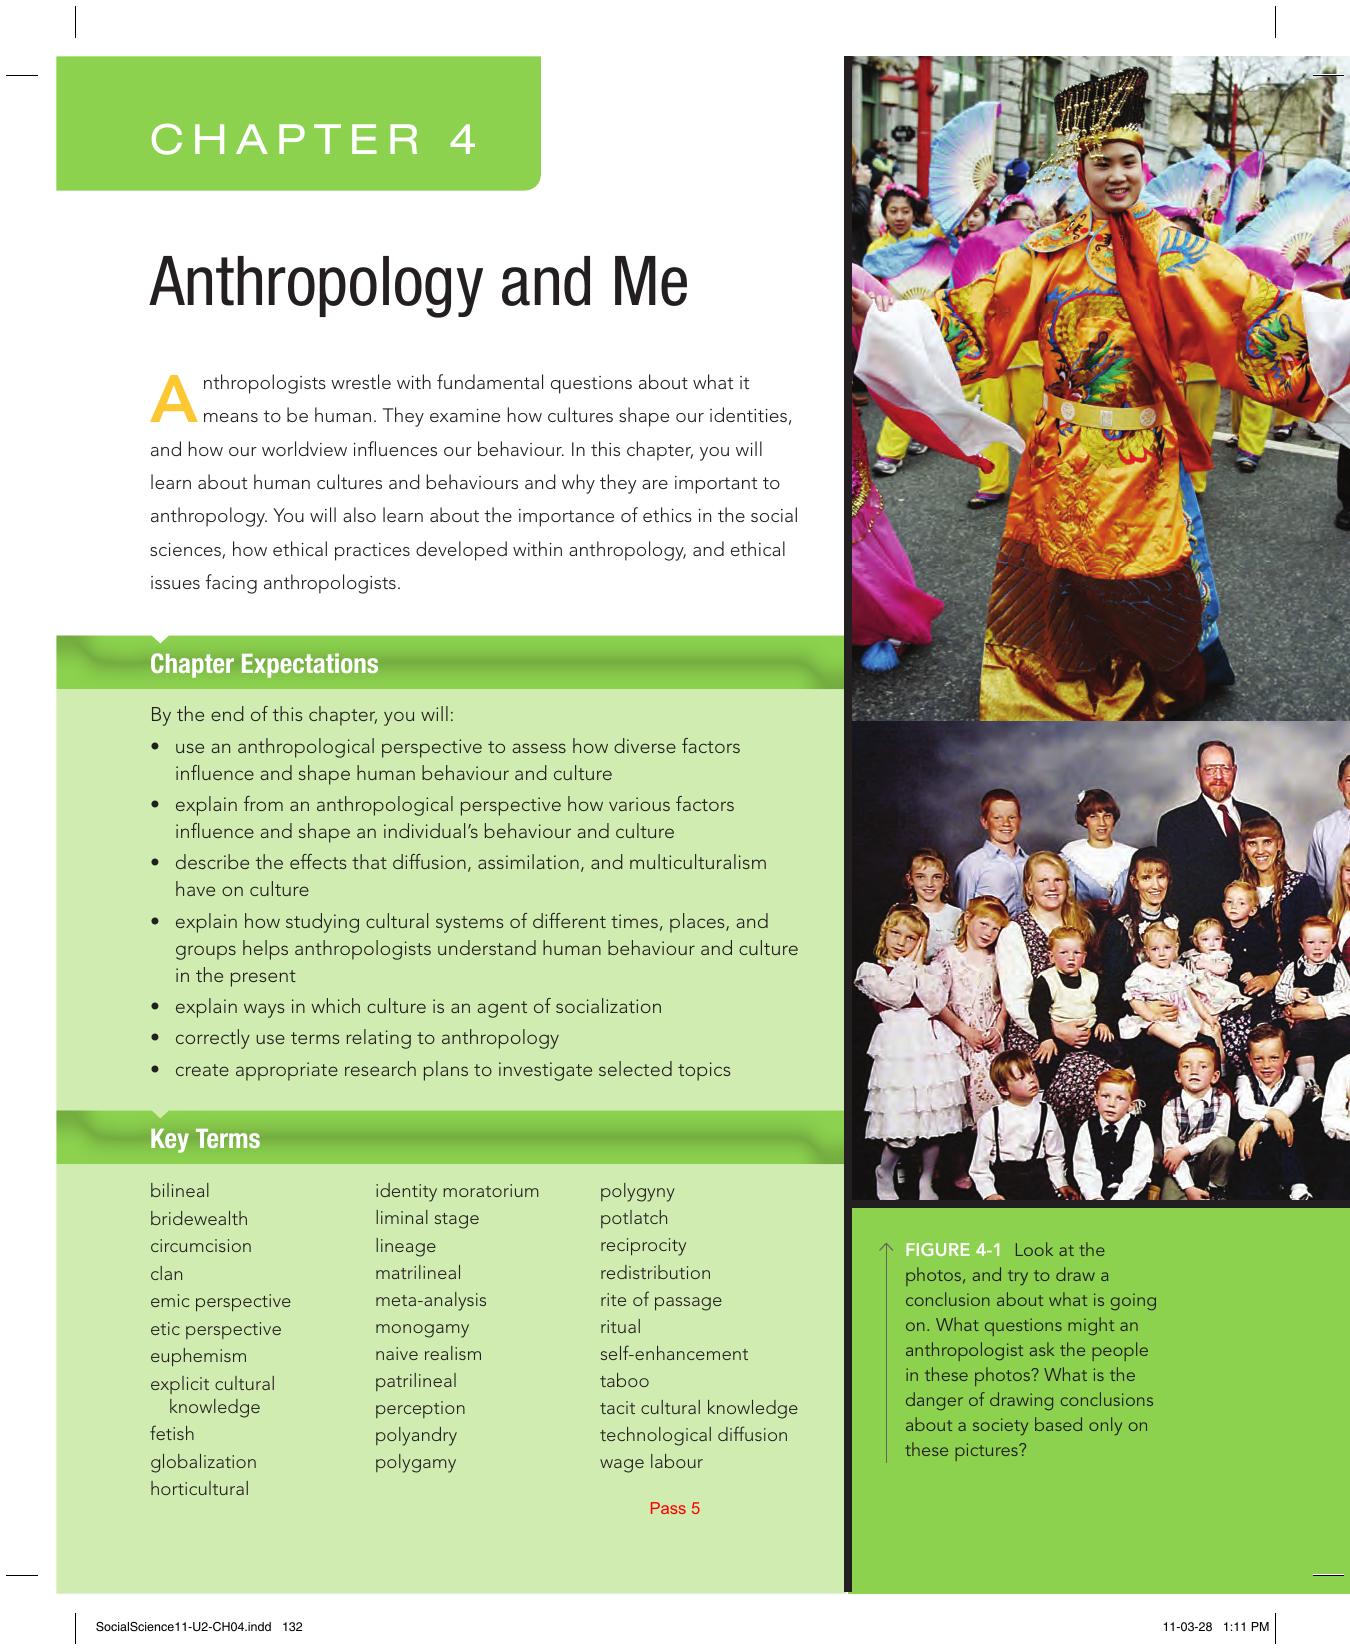 bridewealth anthropology